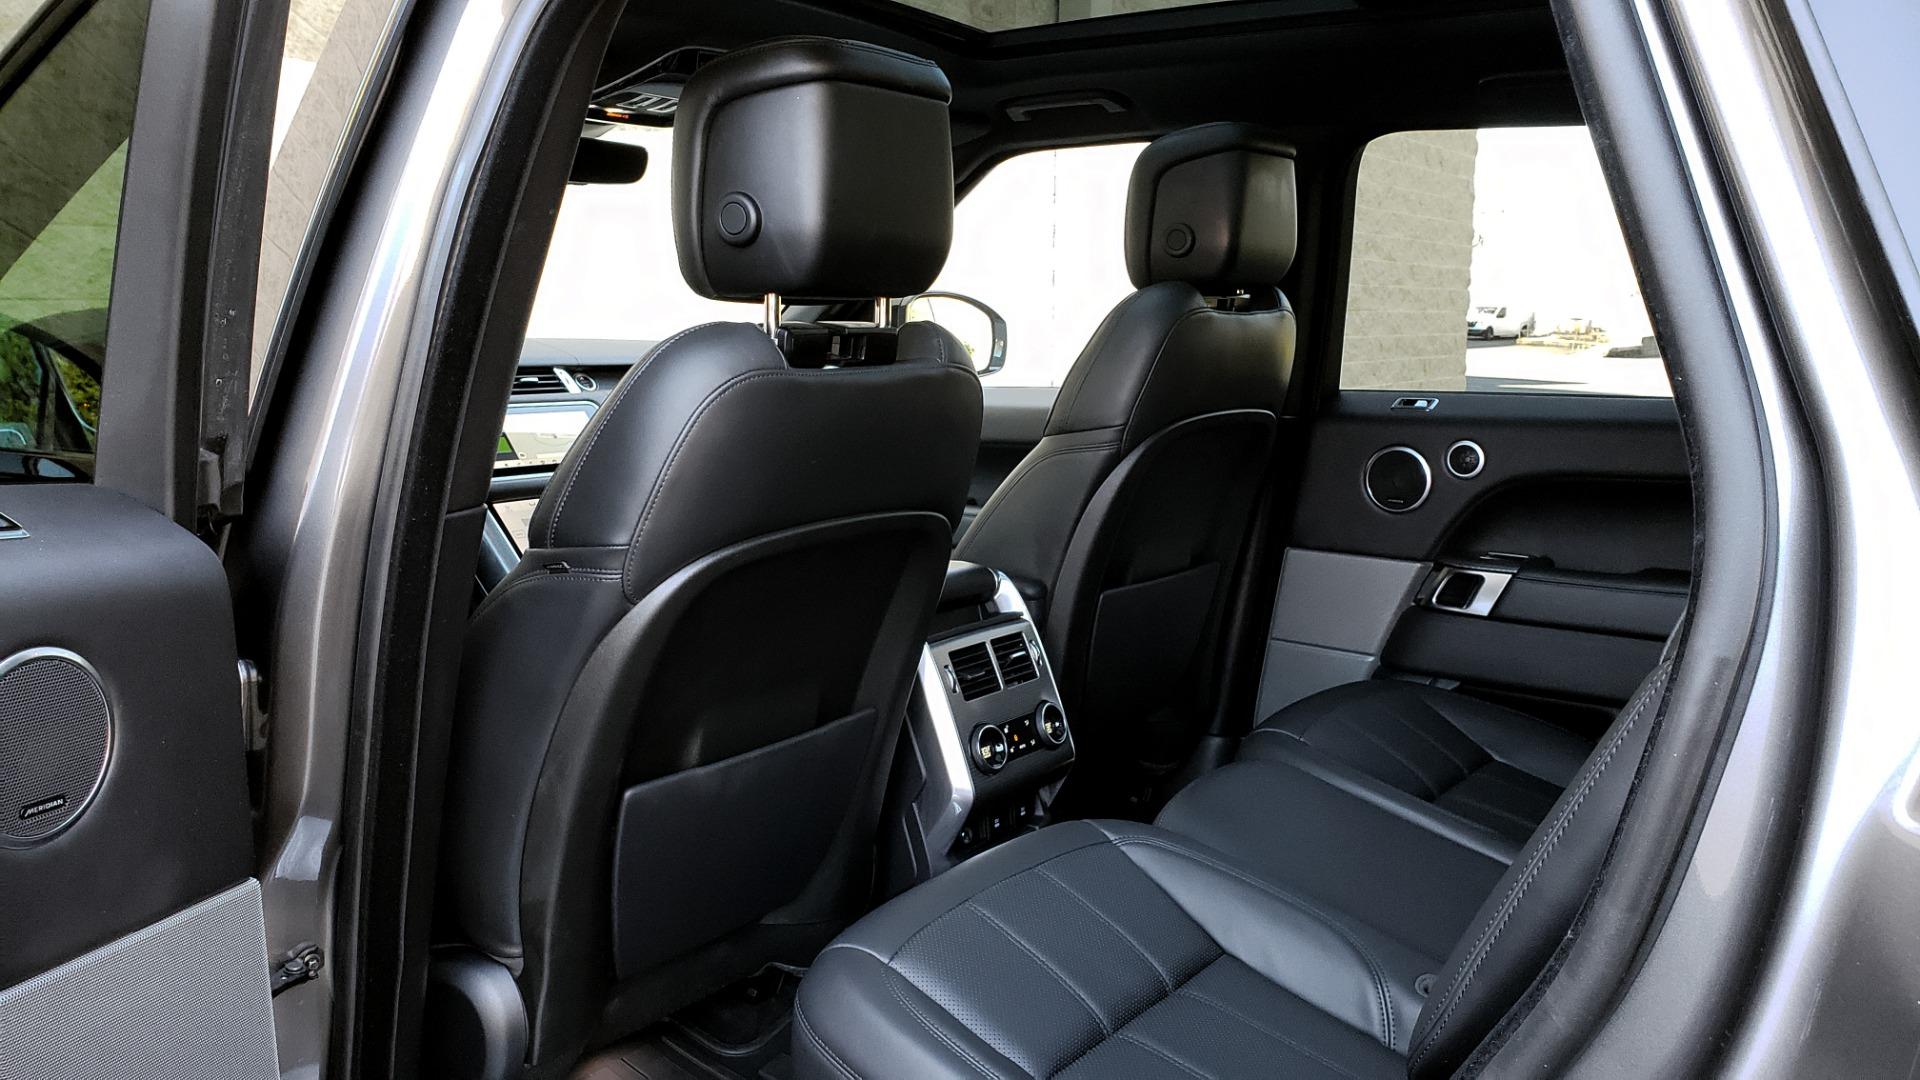 Used 2018 Land Rover RANGE ROVER SPORT DYNAMIC SC V8 / CLIMATE CMFRT / VISION ASST / MERIDIAN for sale Sold at Formula Imports in Charlotte NC 28227 73